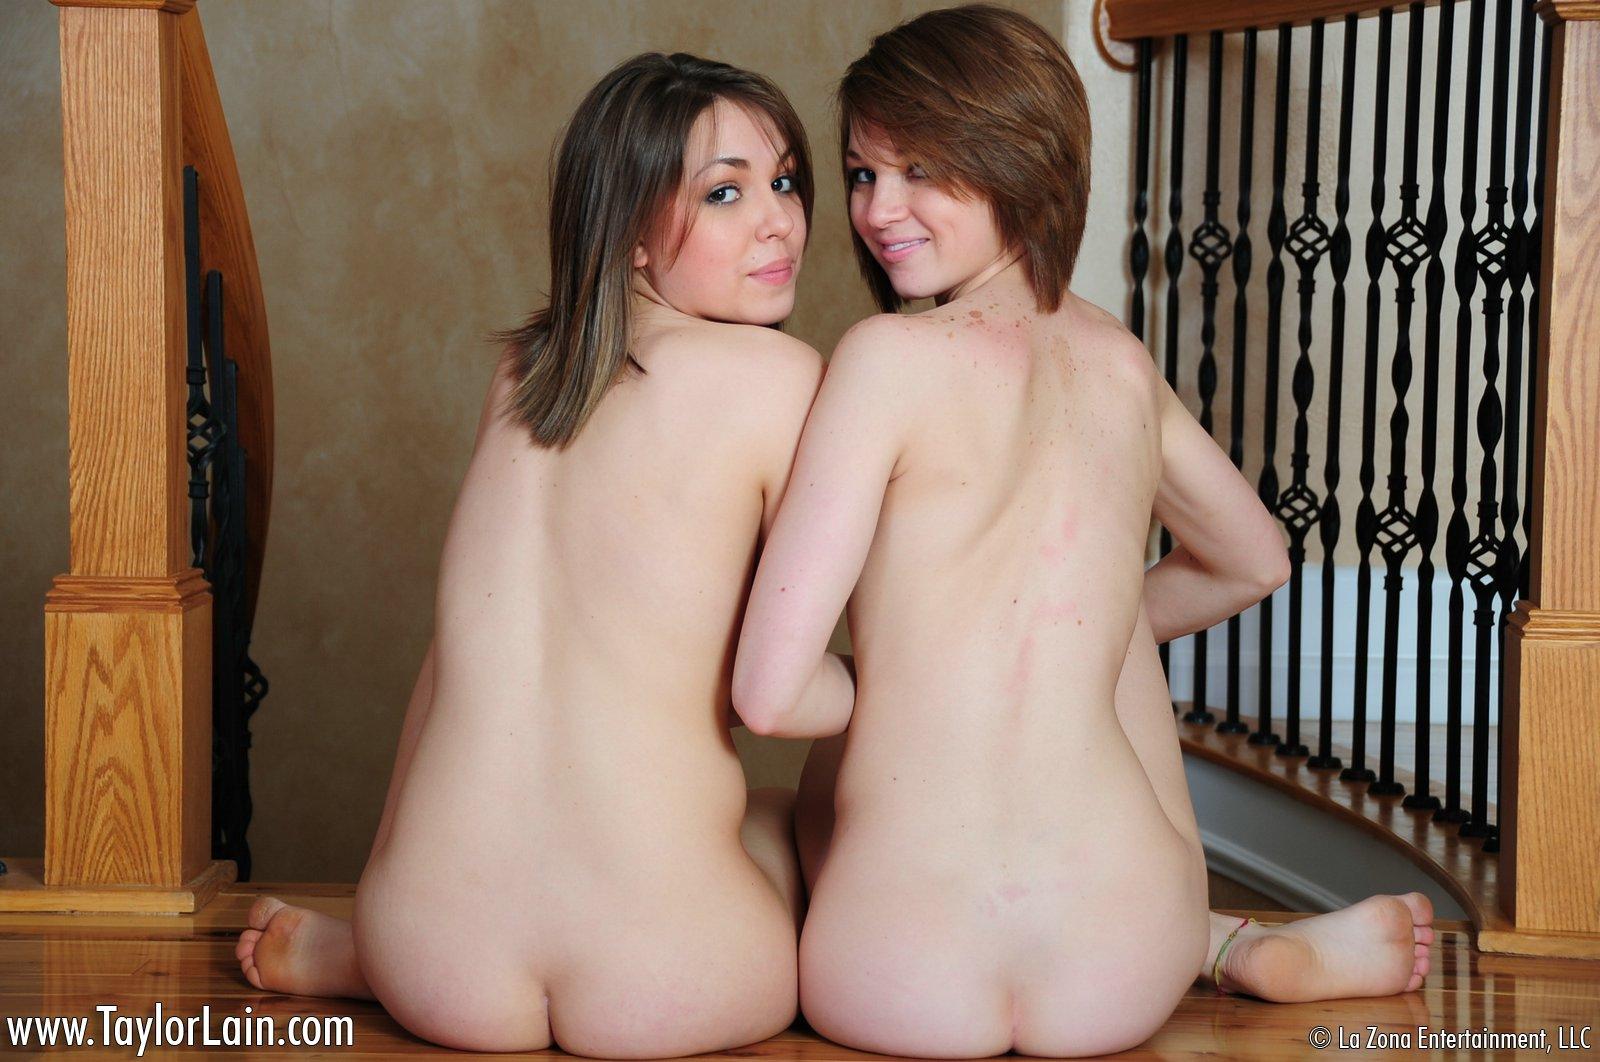 Oln twins nude